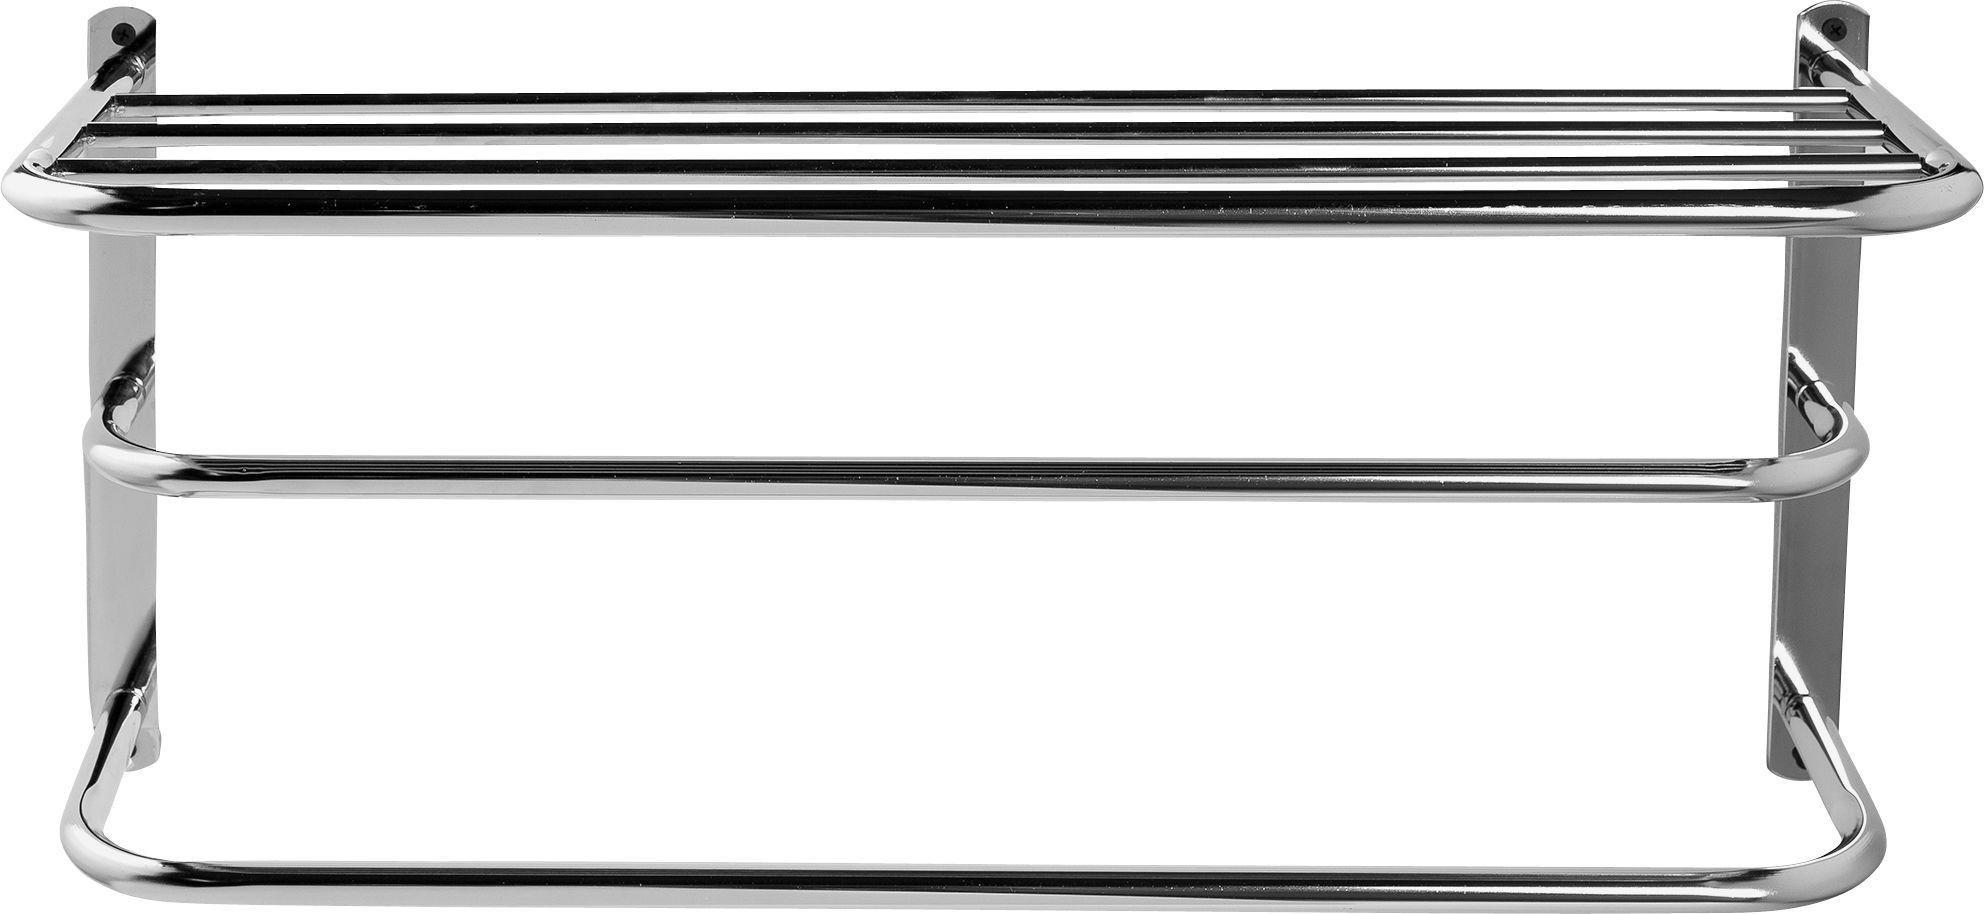 Buy HOME Wall Mounted Towel Rail with Shelf Metal Towel rails